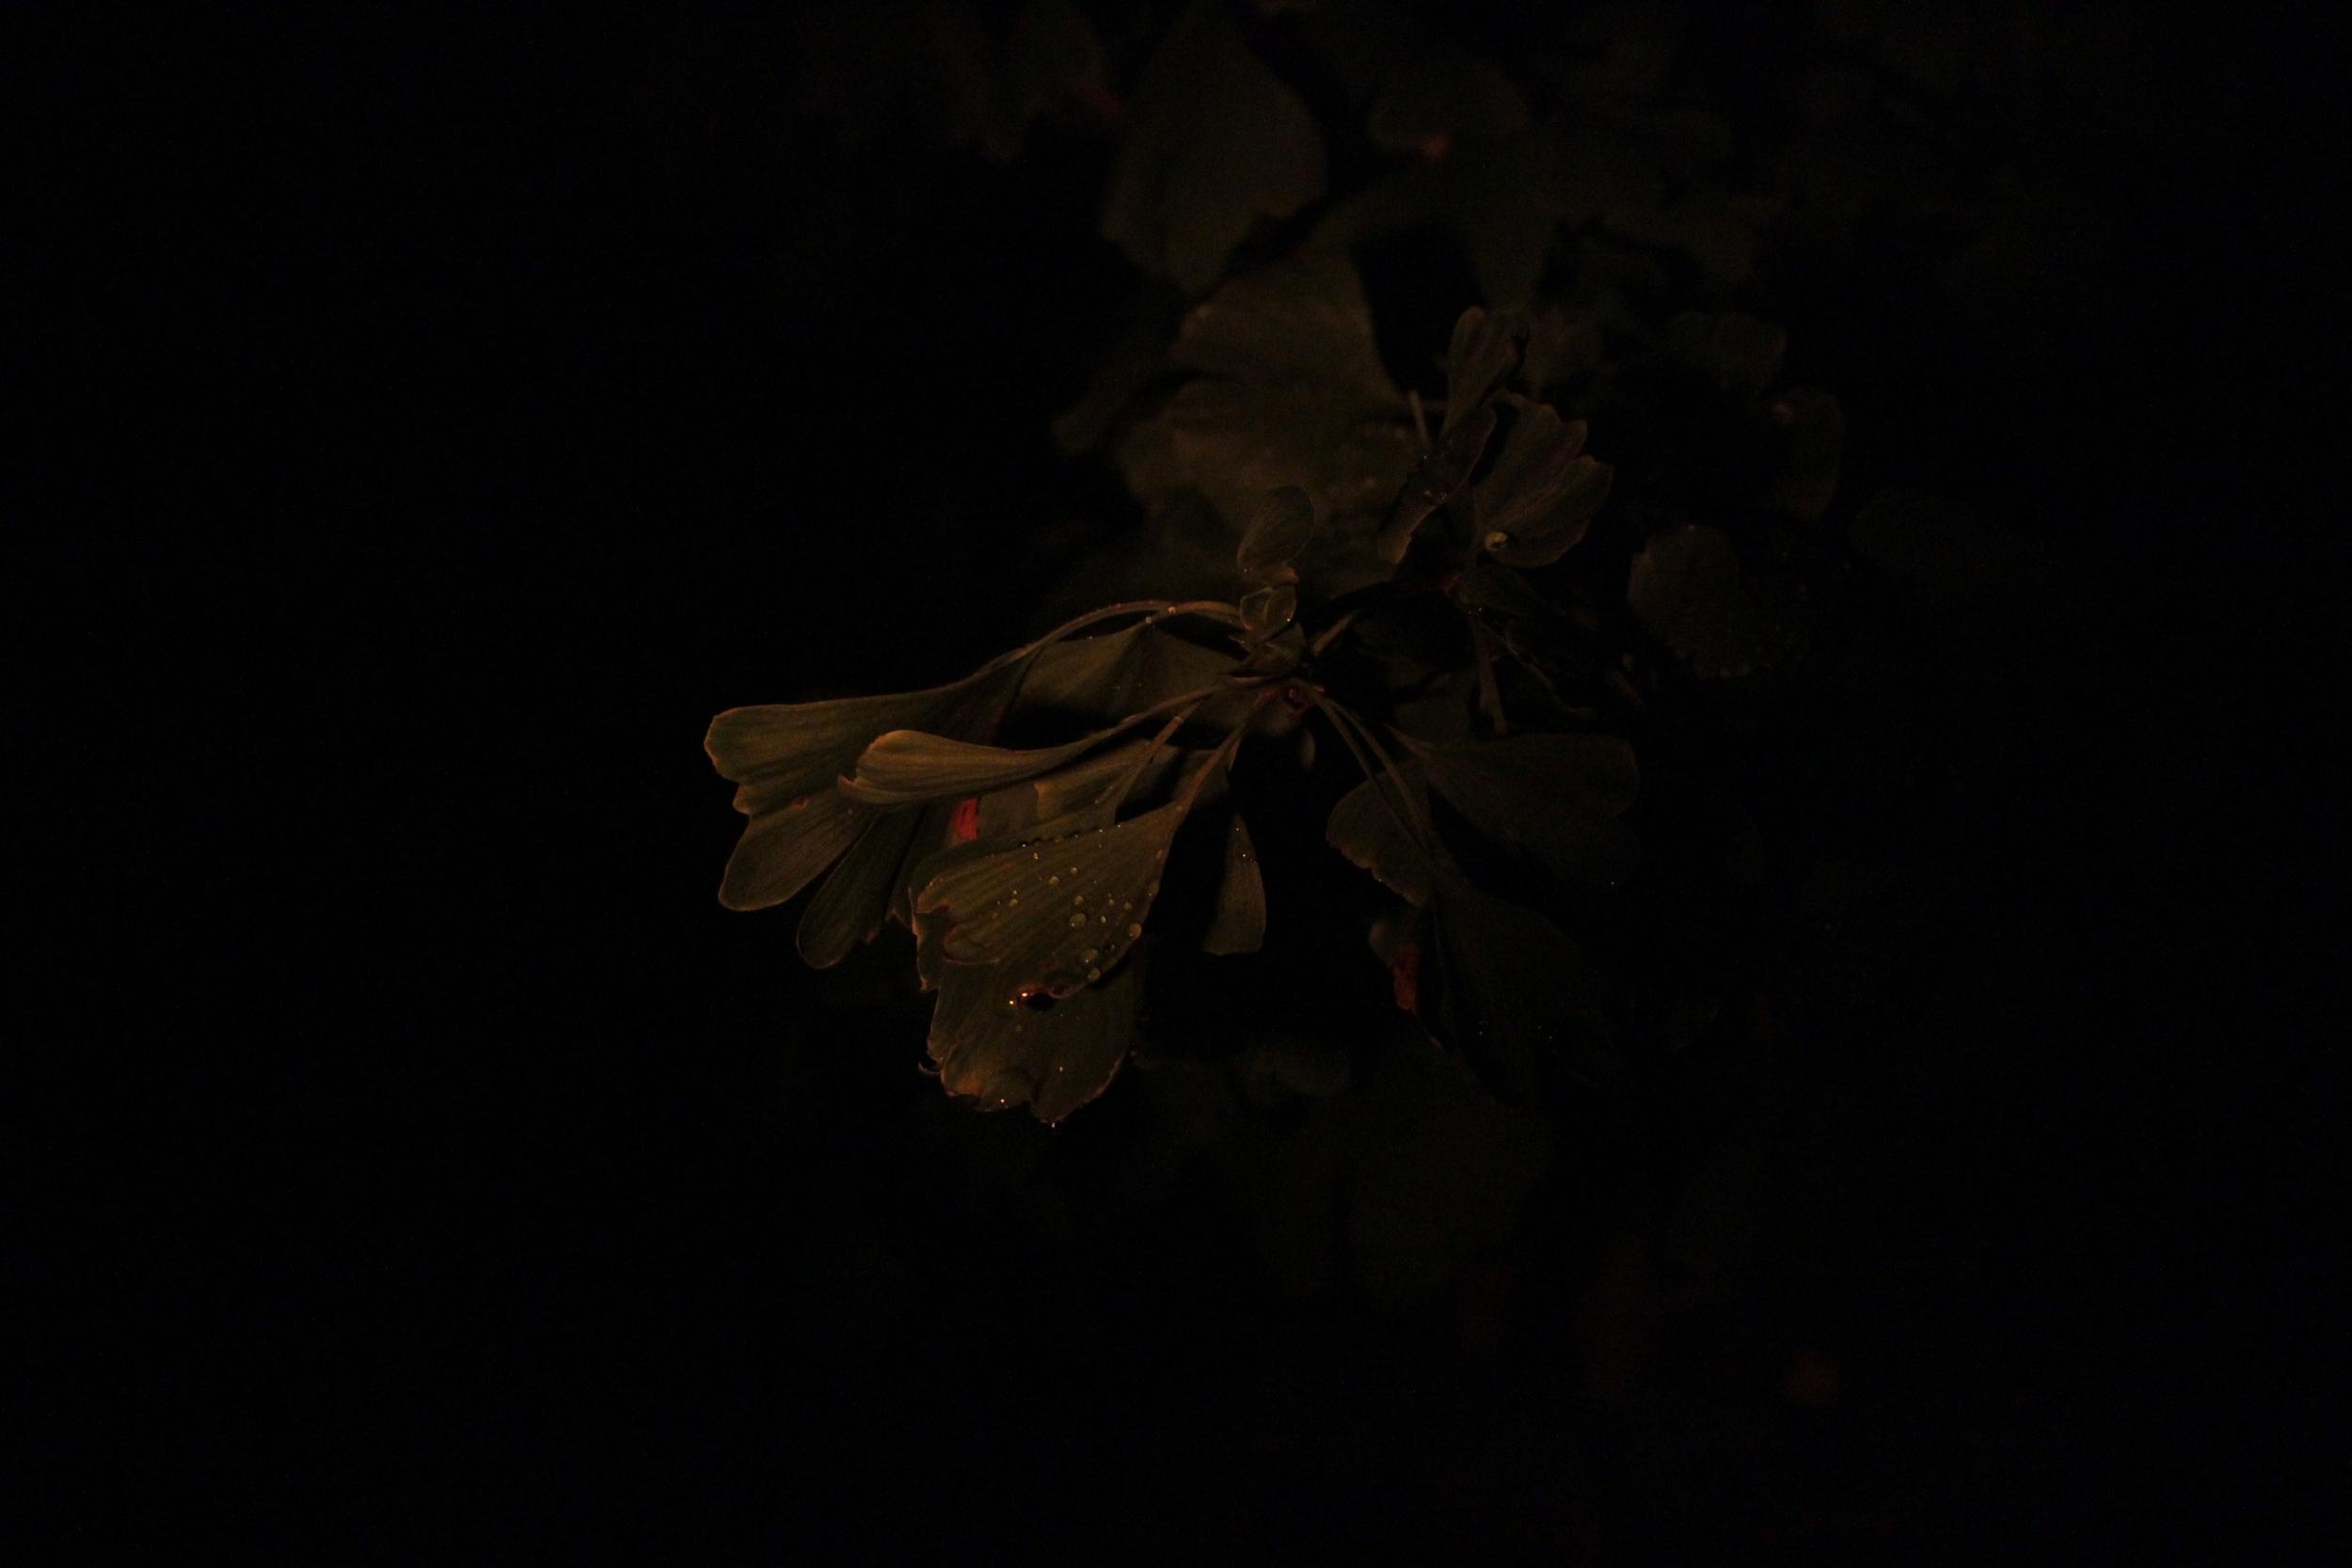 Gingko biloba (at night)